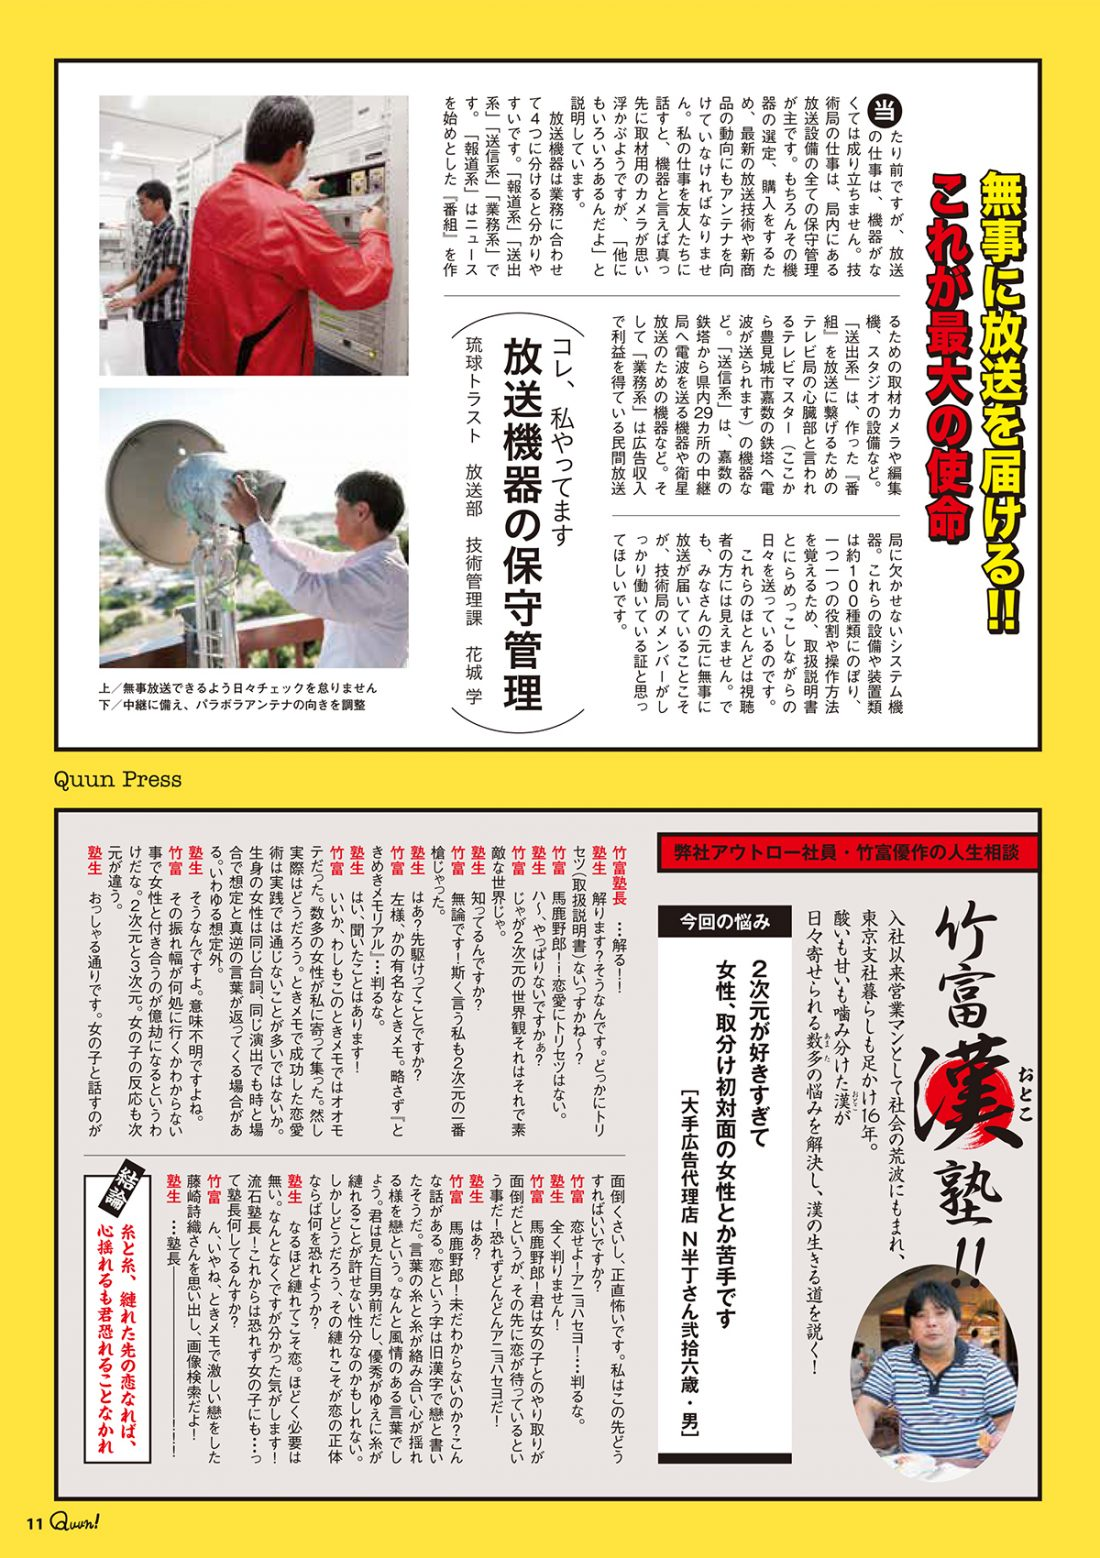 http://www.qab.co.jp/qgoro/wp-content/uploads/quun_0913-1100x1558.jpg